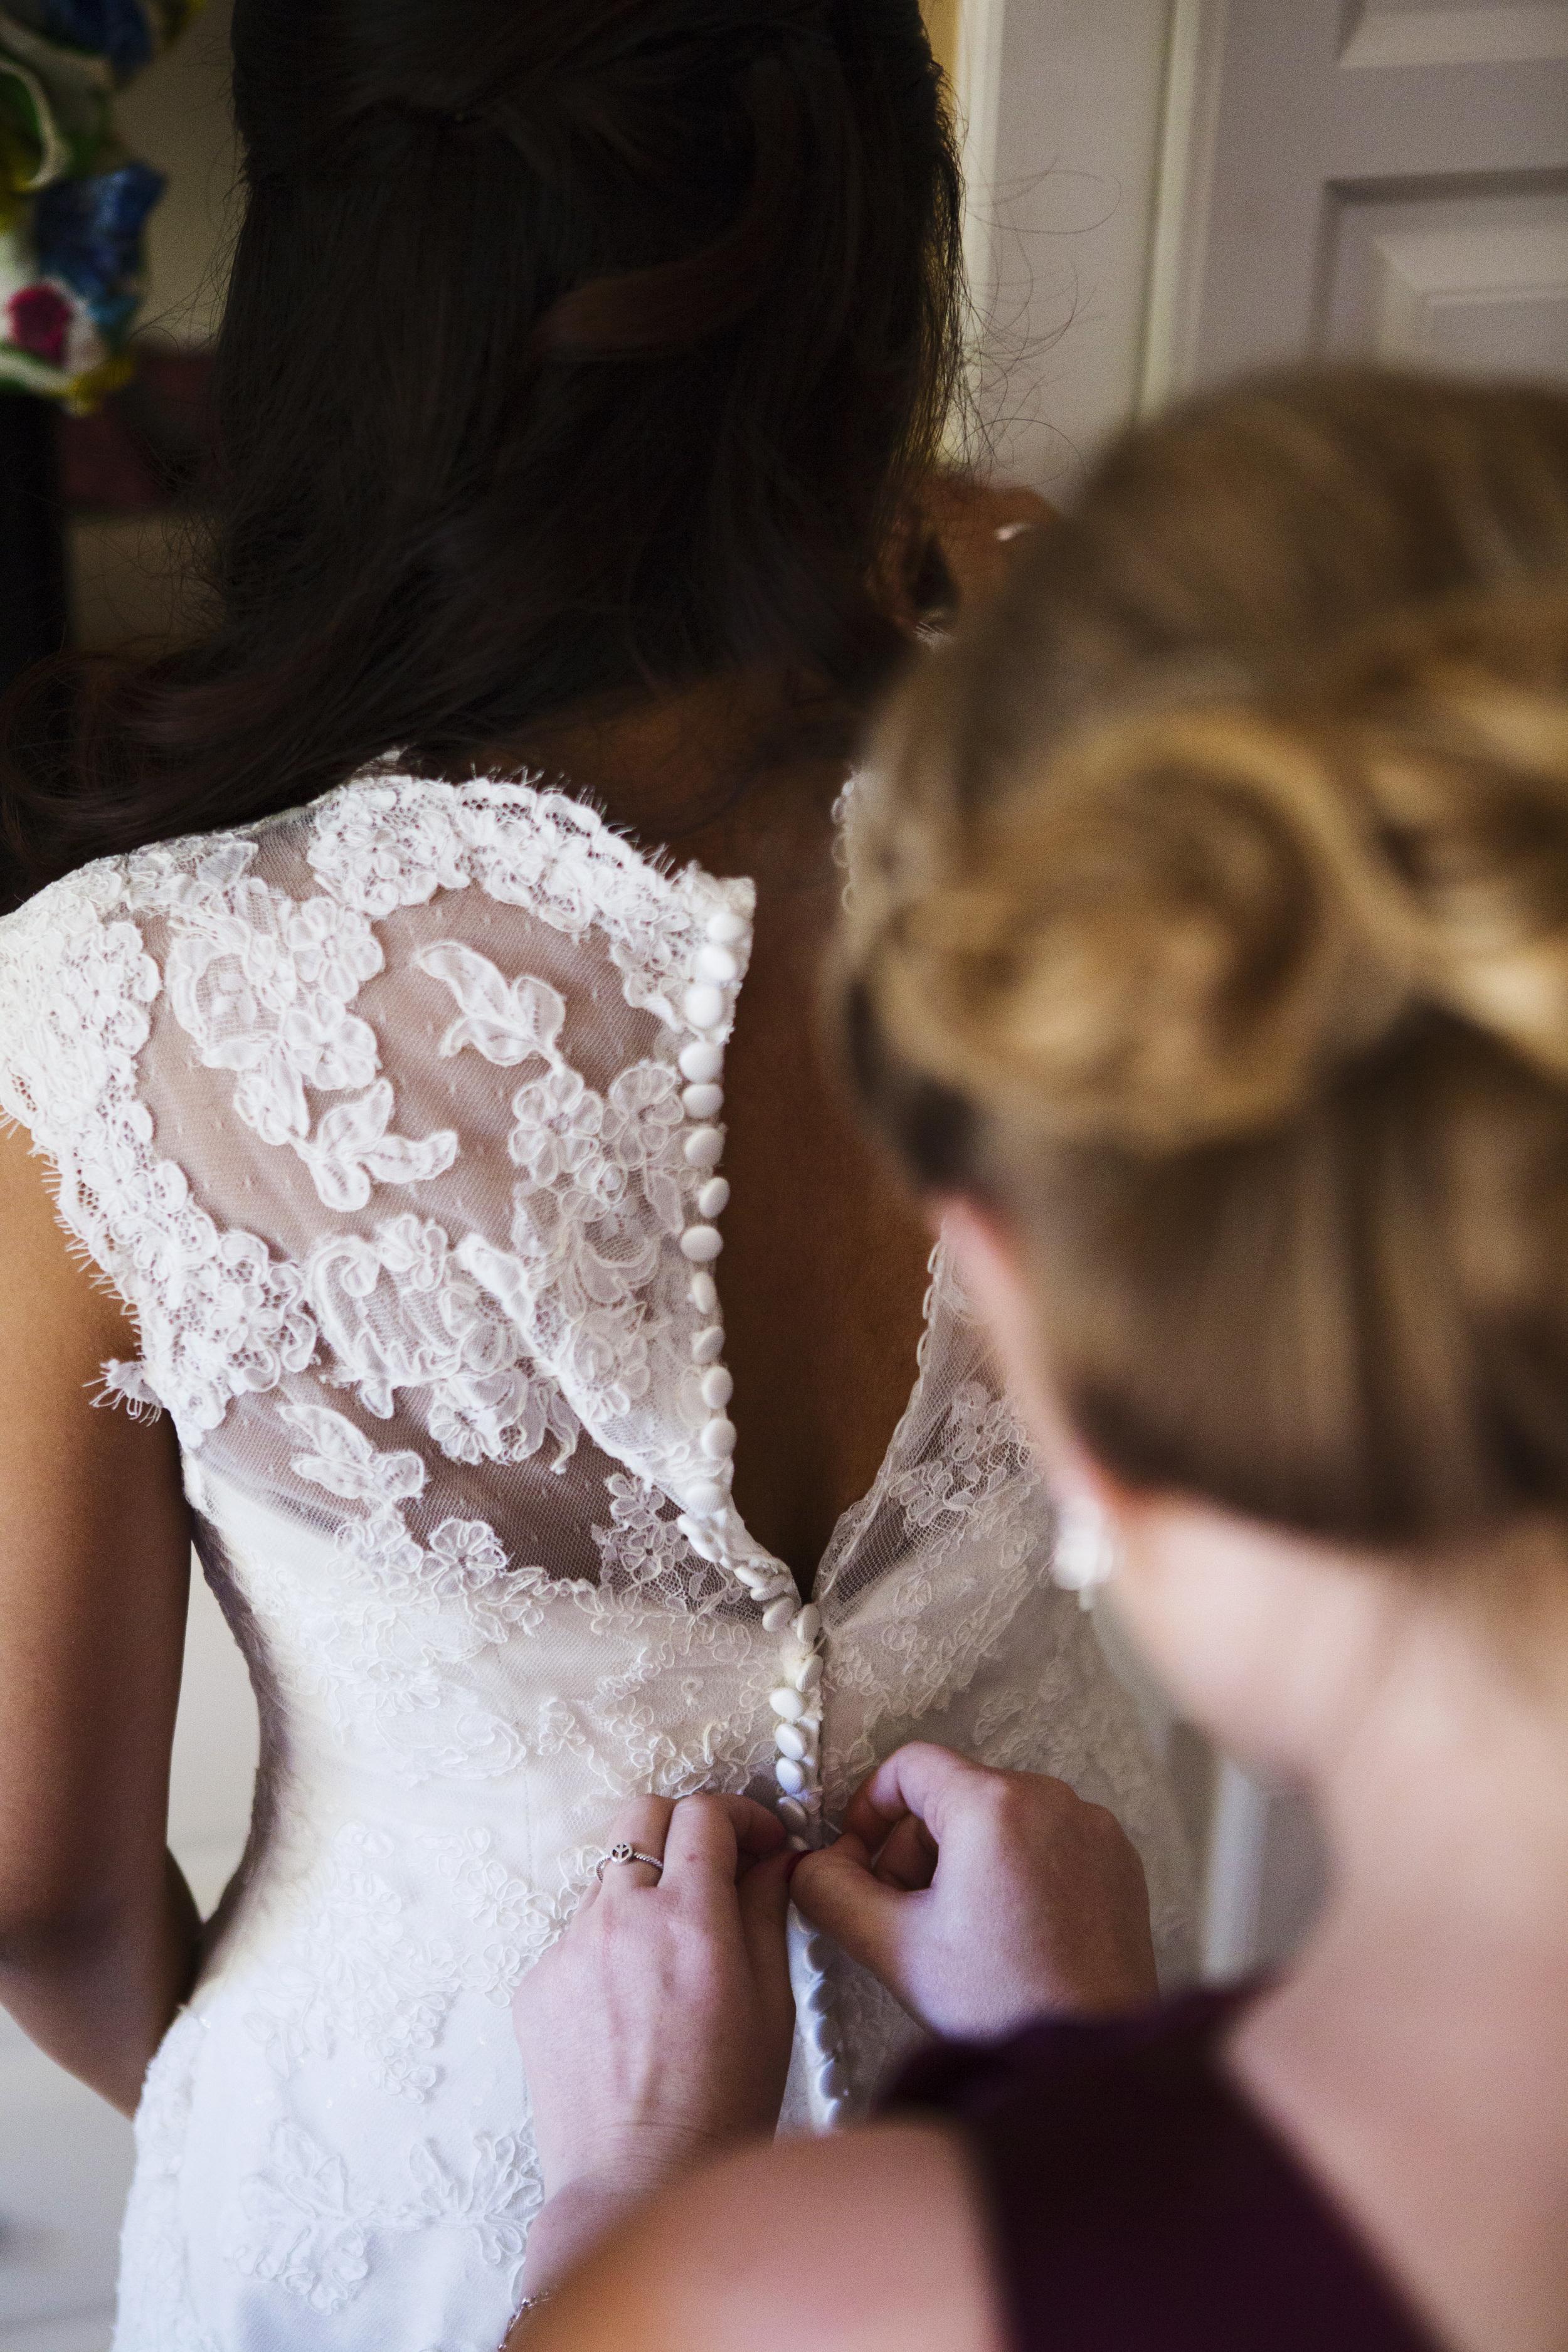 arizona wedding, wedding planner, scottsdale wedding planner, destination wedding planner, phoenix wedding planner, wedding coordinator, event planner, wedding design